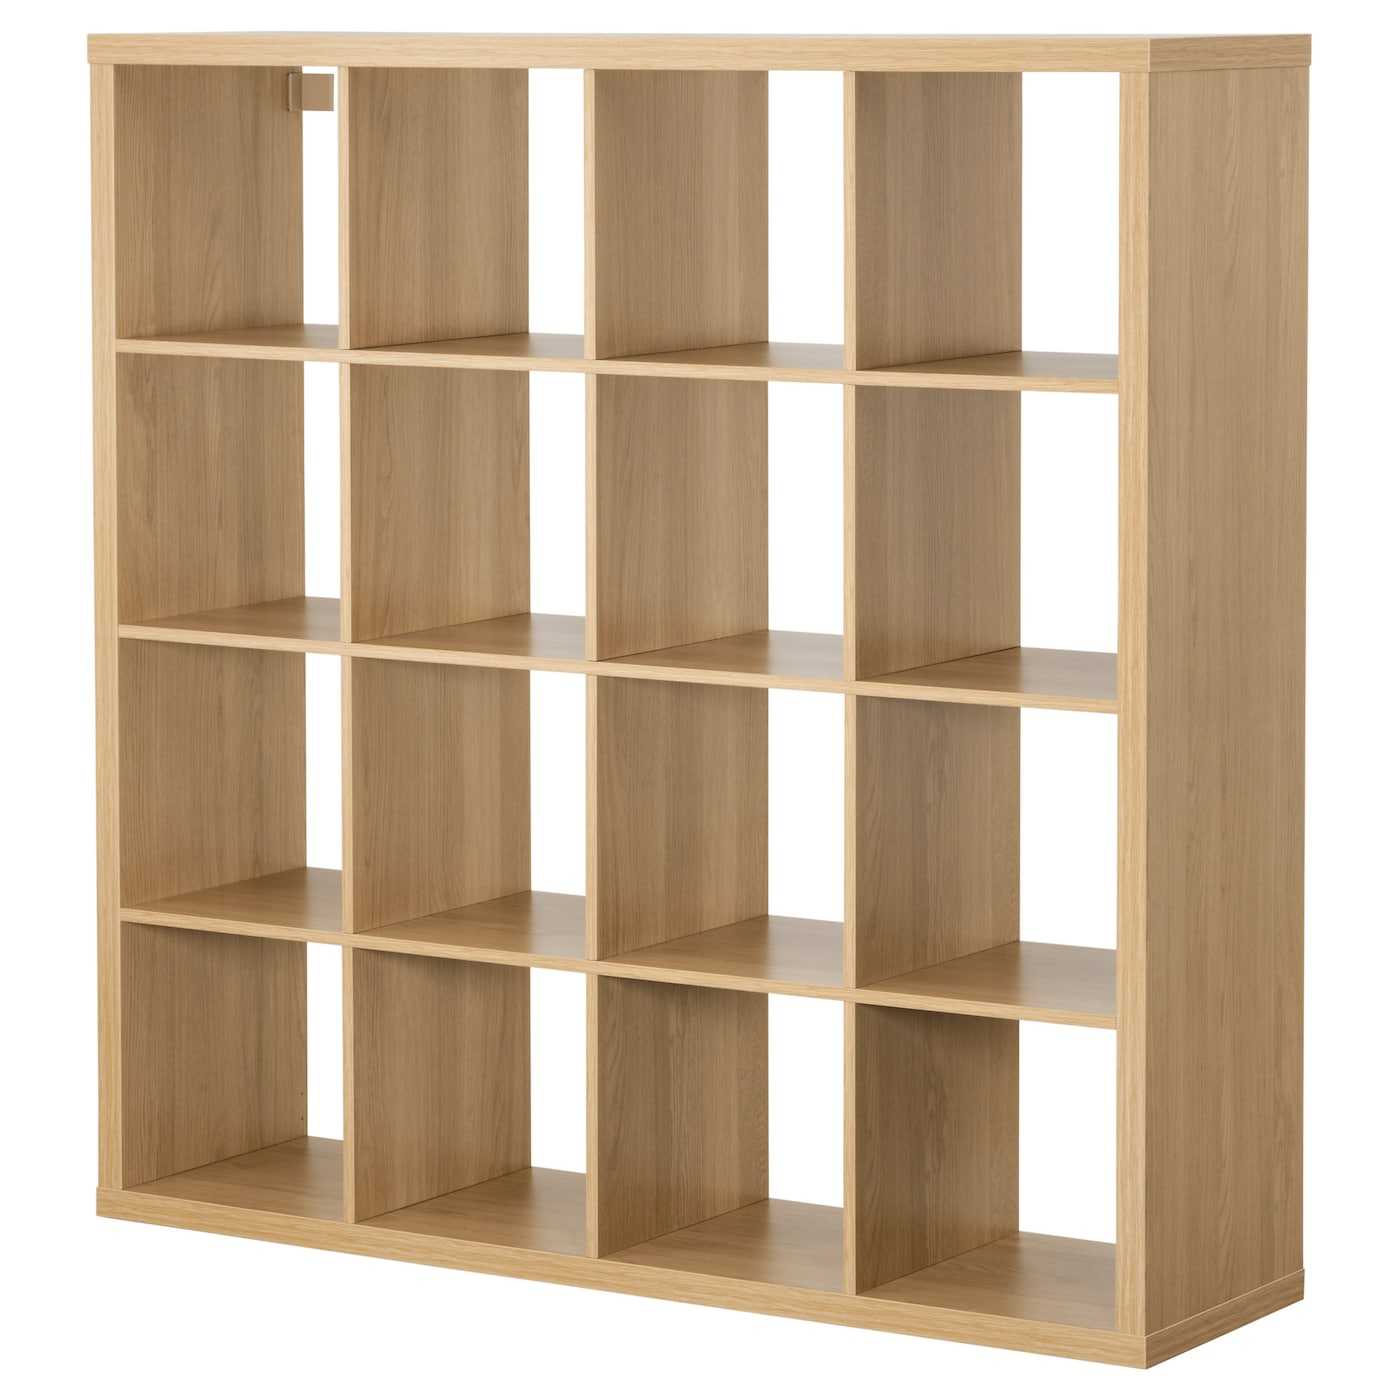 kallax shelving unit oak effect 147 x 147 cm - ikea